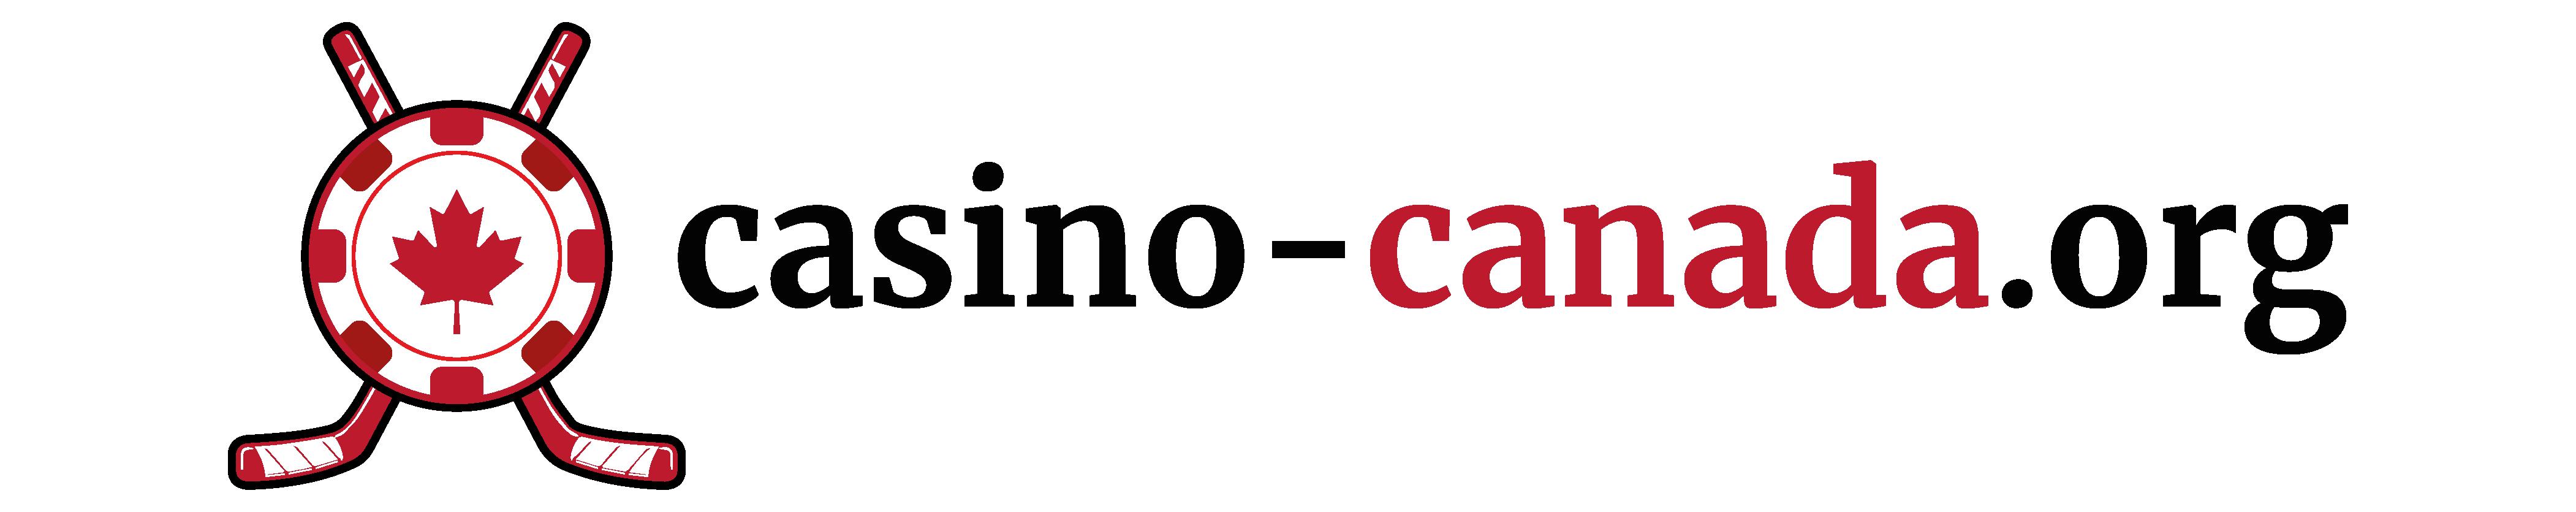 Casino-Canada.org